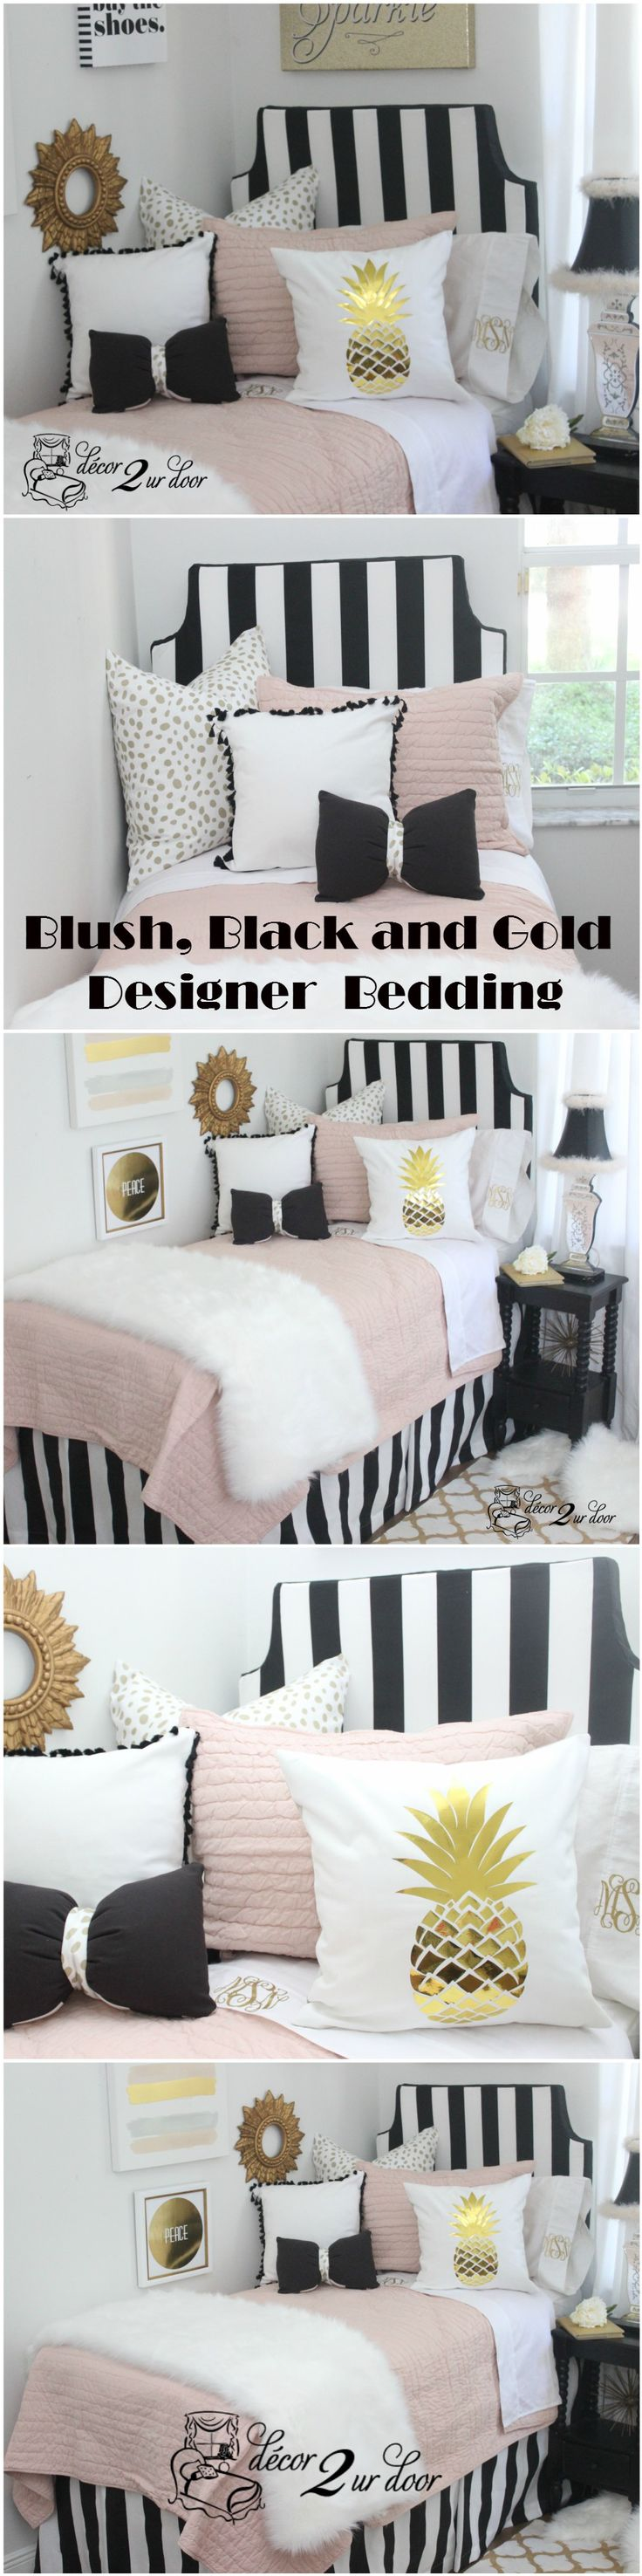 25 Best Ideas About Dorm Room Beds On Pinterest Dorm